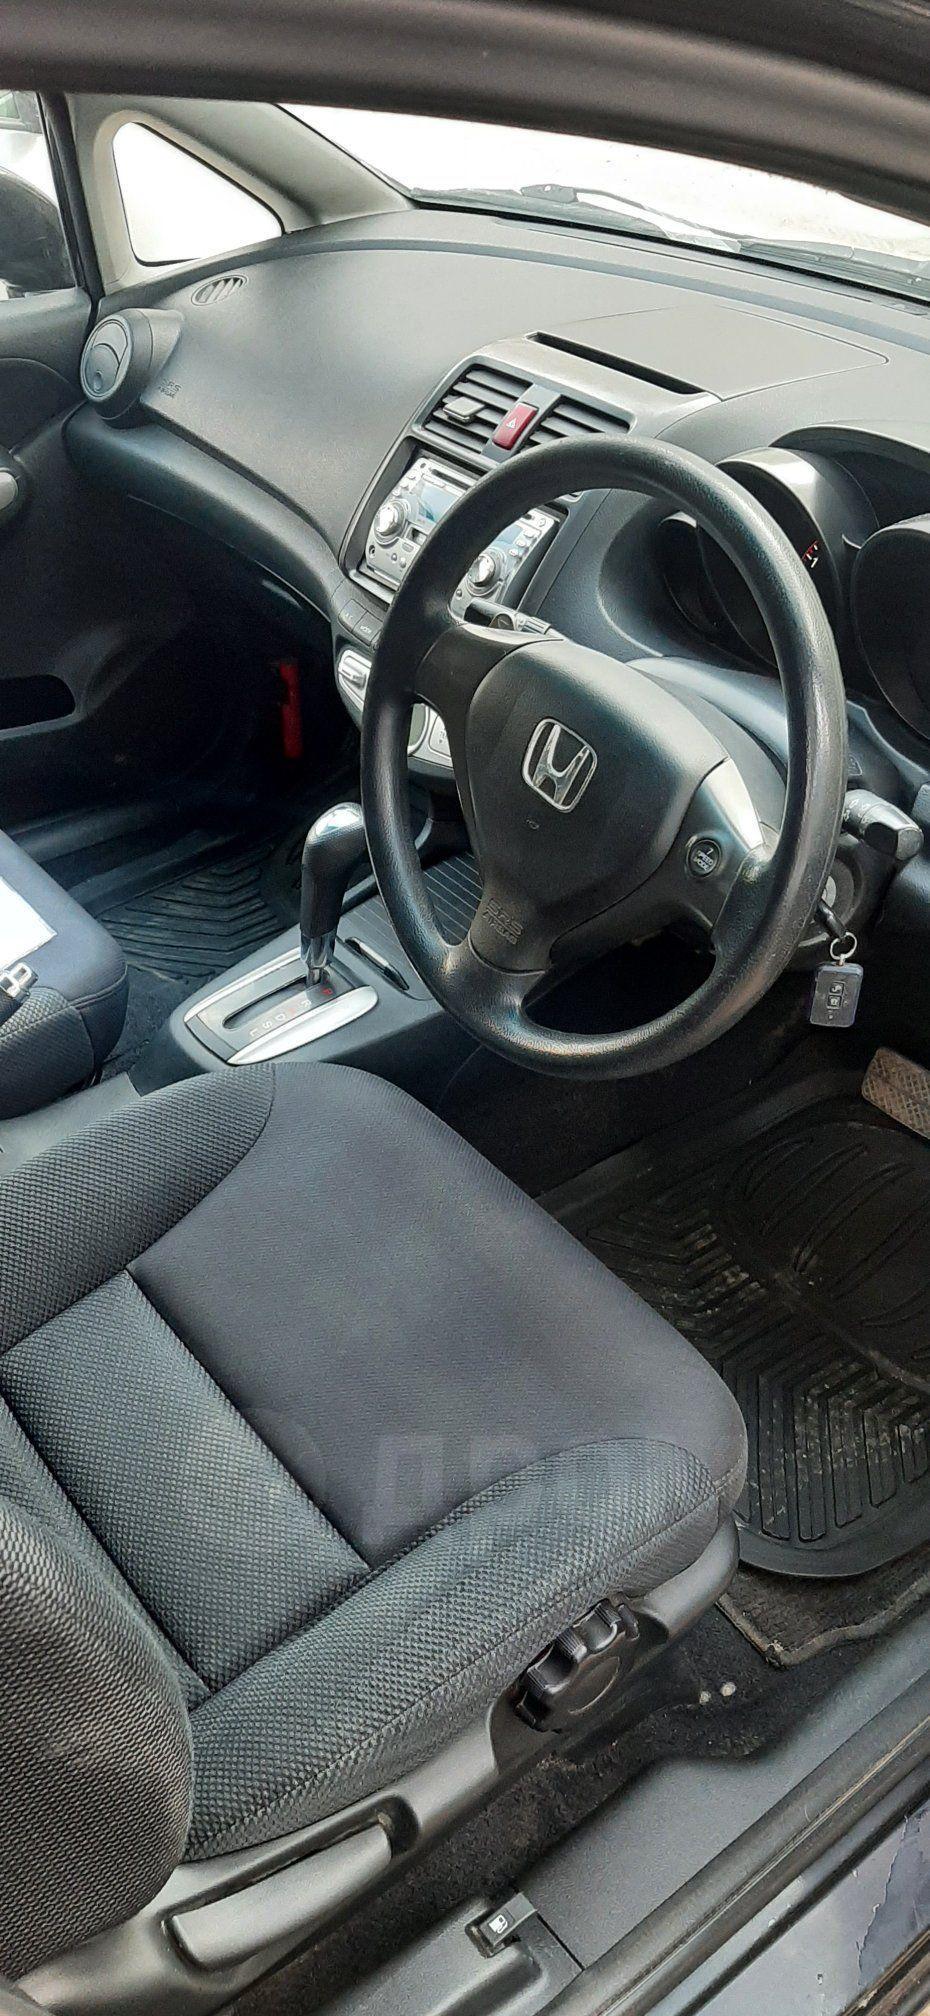 Honda Airwave 2006